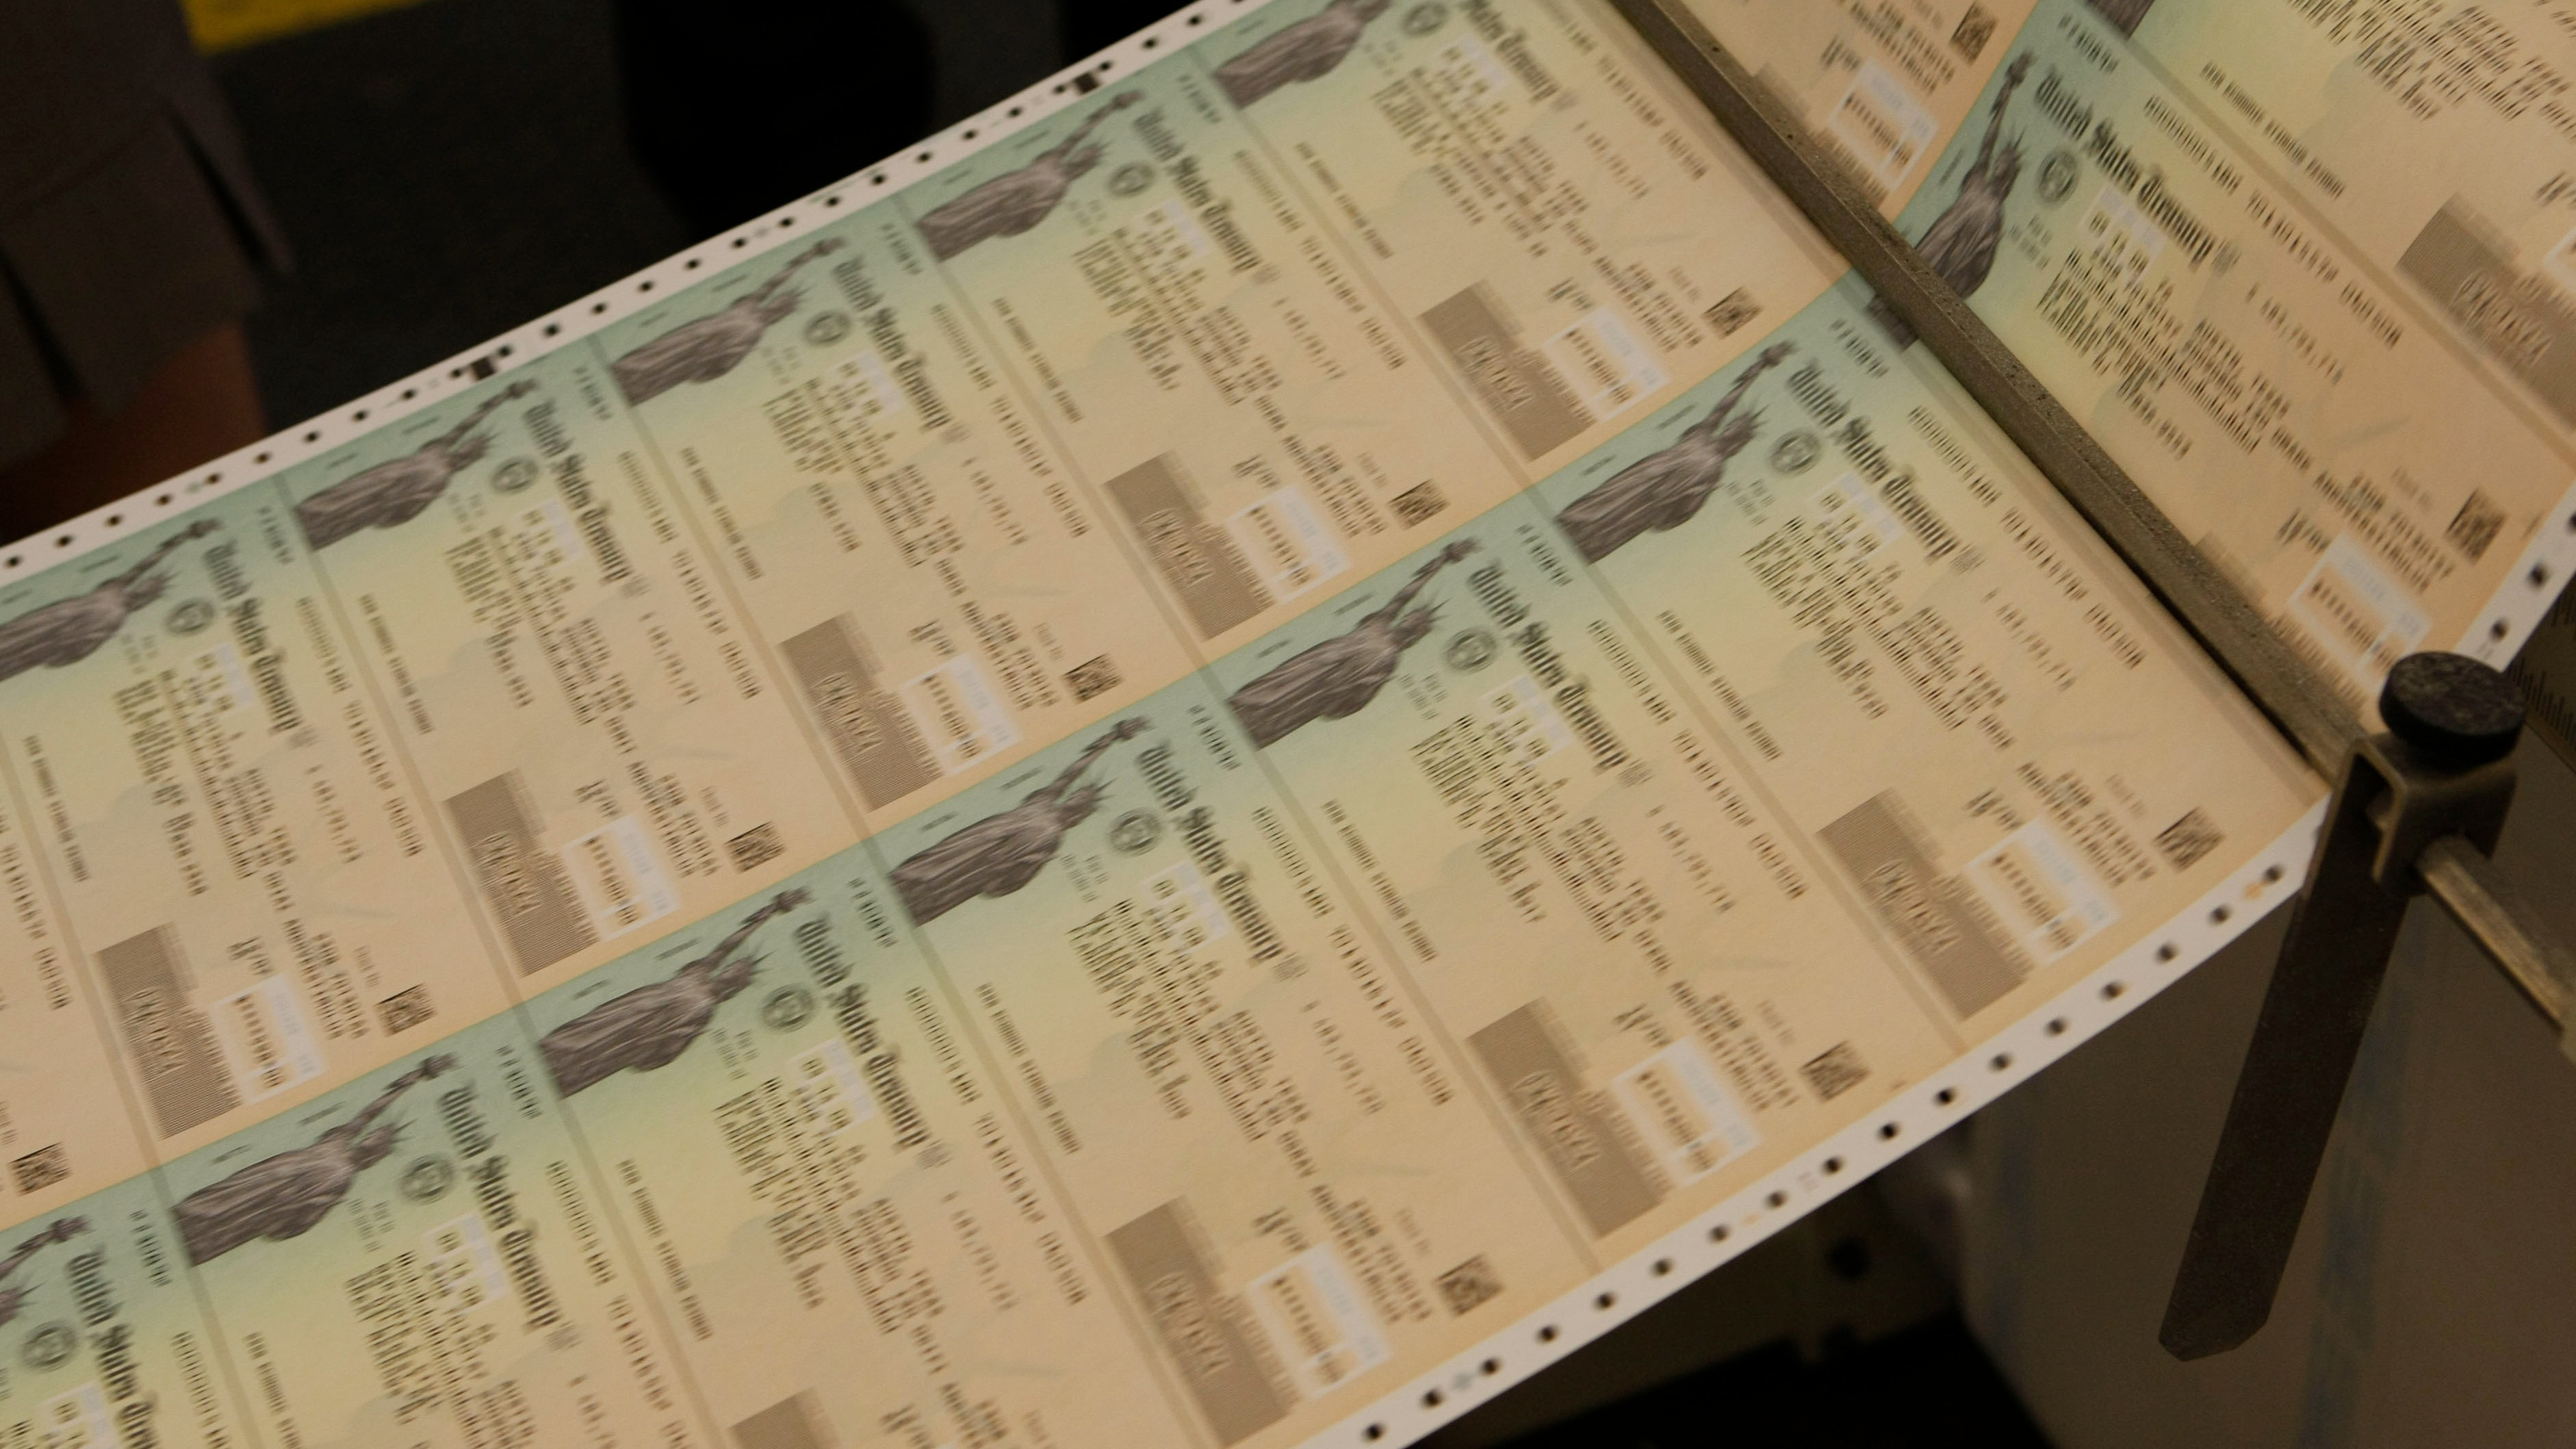 Freshly printed economic stimulus checks roll off the presses